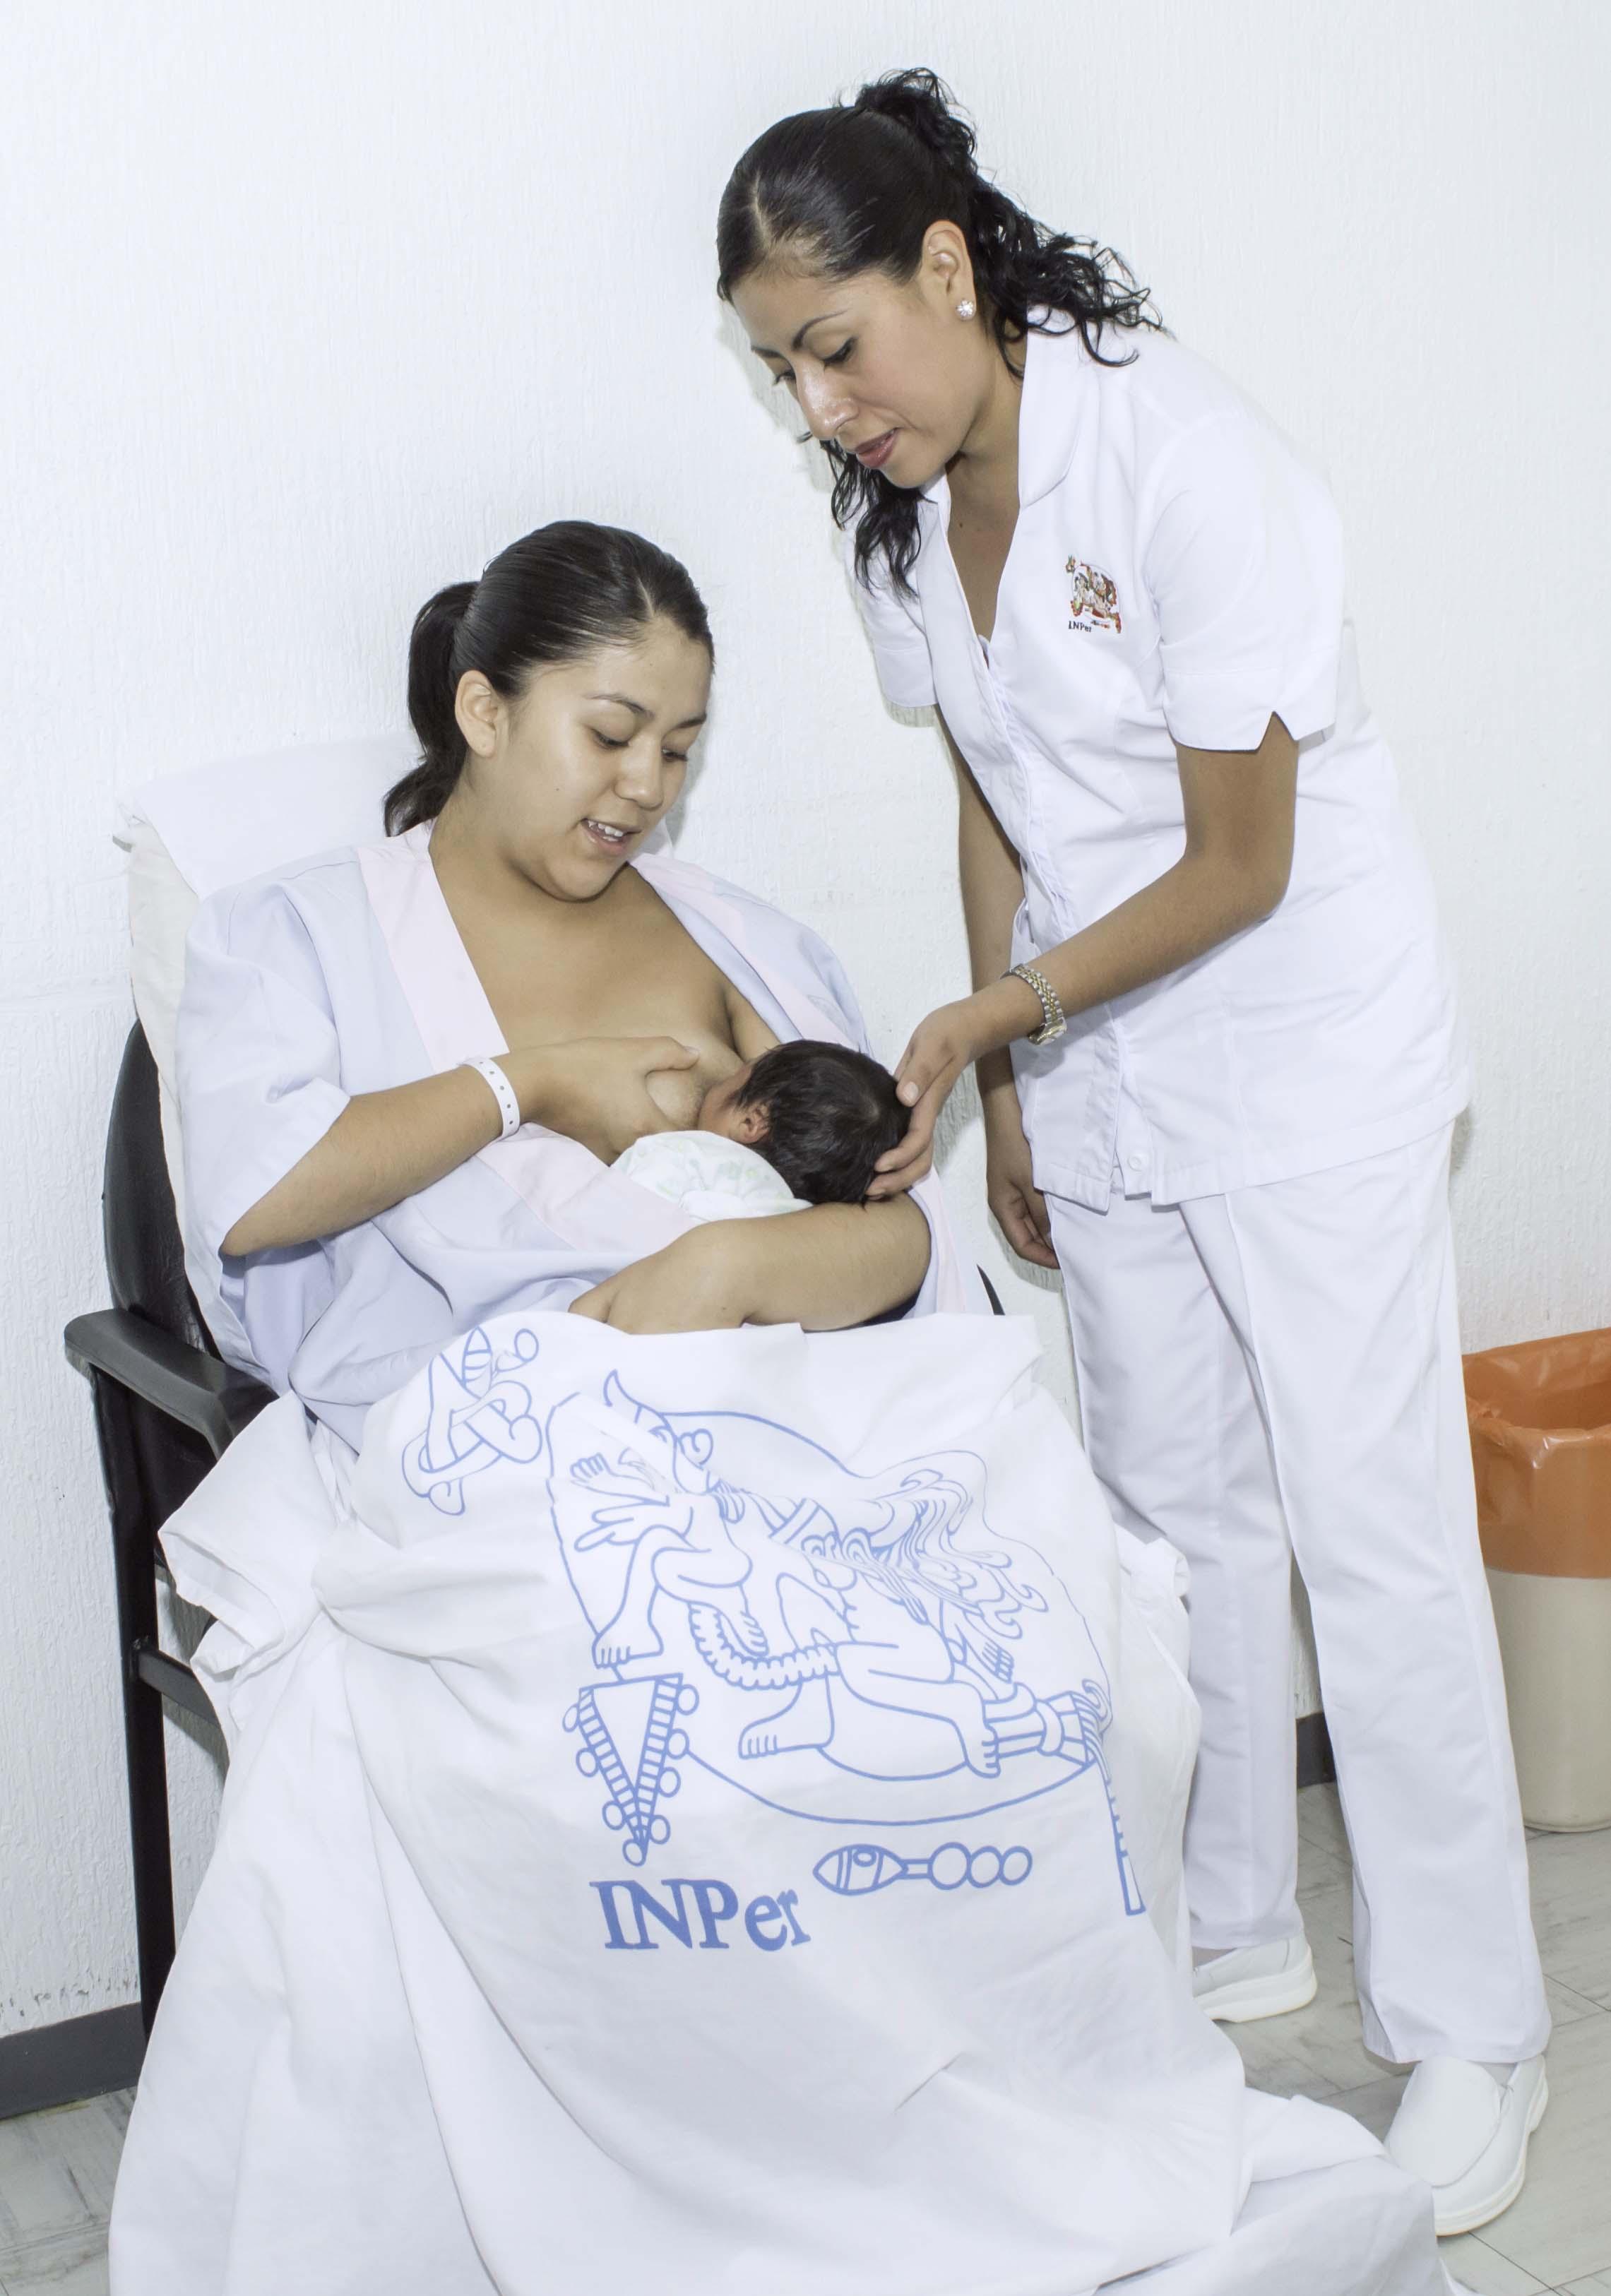 El Instituto Nacional de Perionatología reforzará la cultura de la lactancia materna